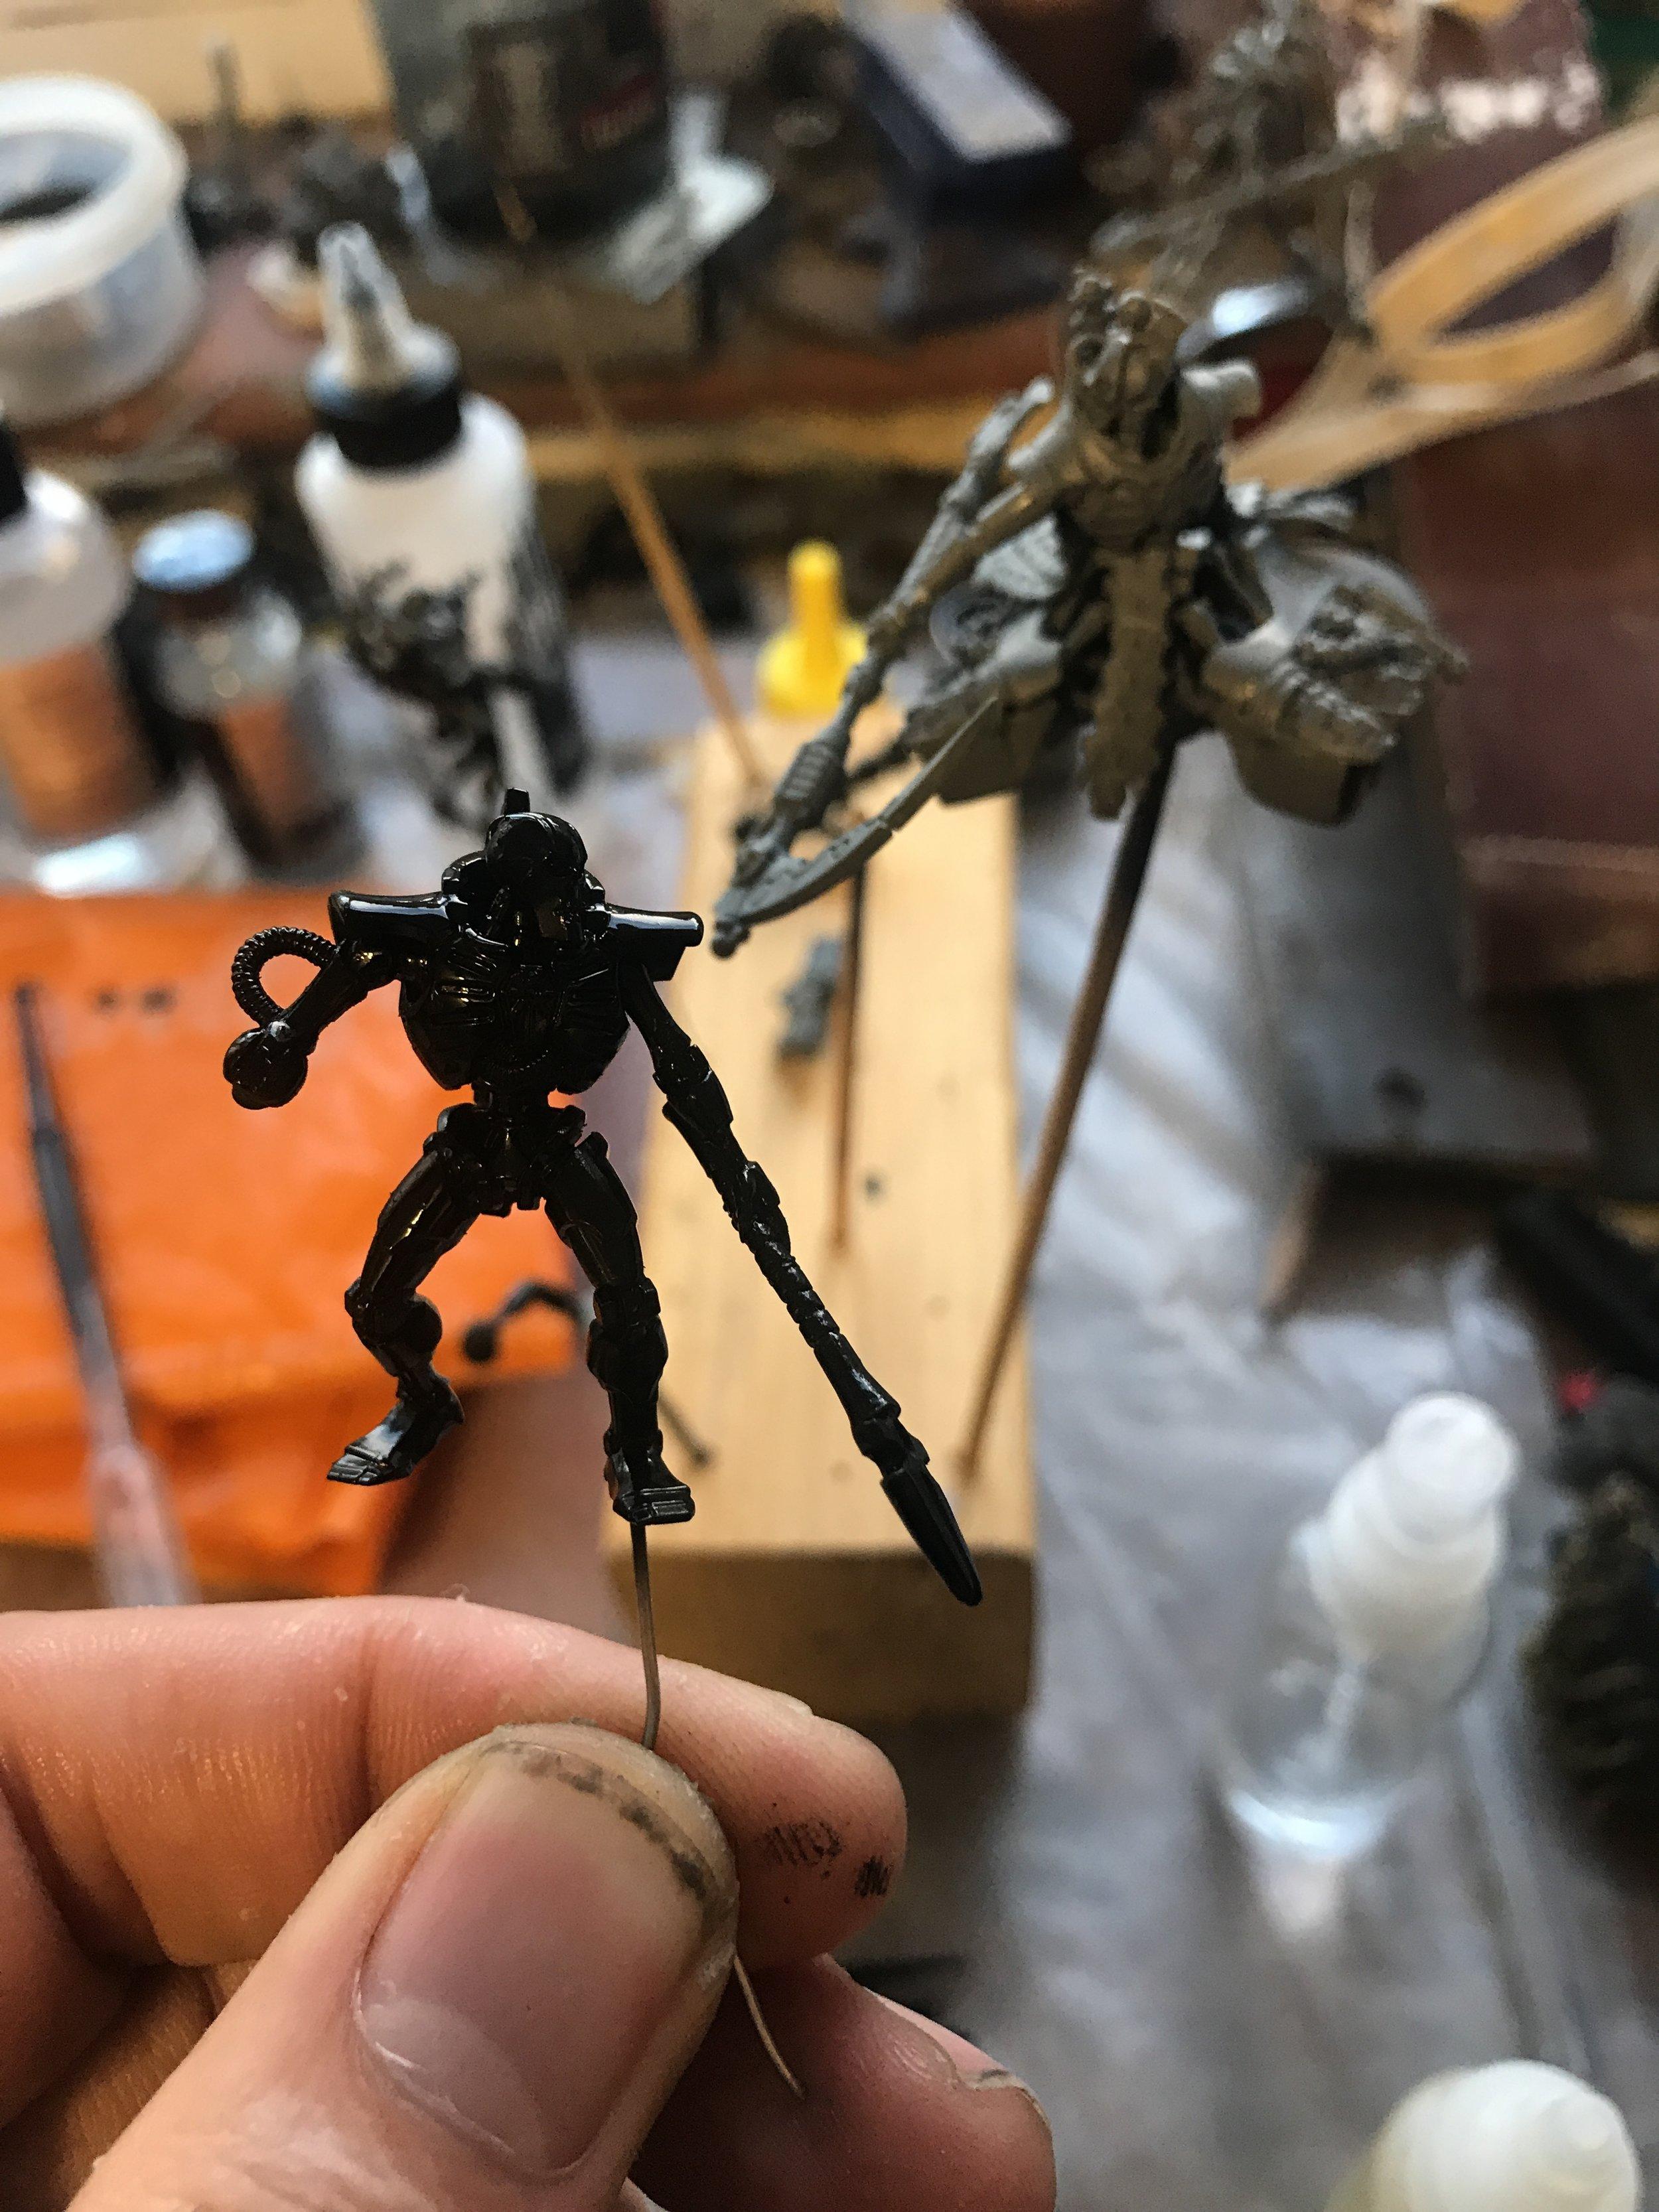 The Immortal Chosen having its first coat of gloss black primer